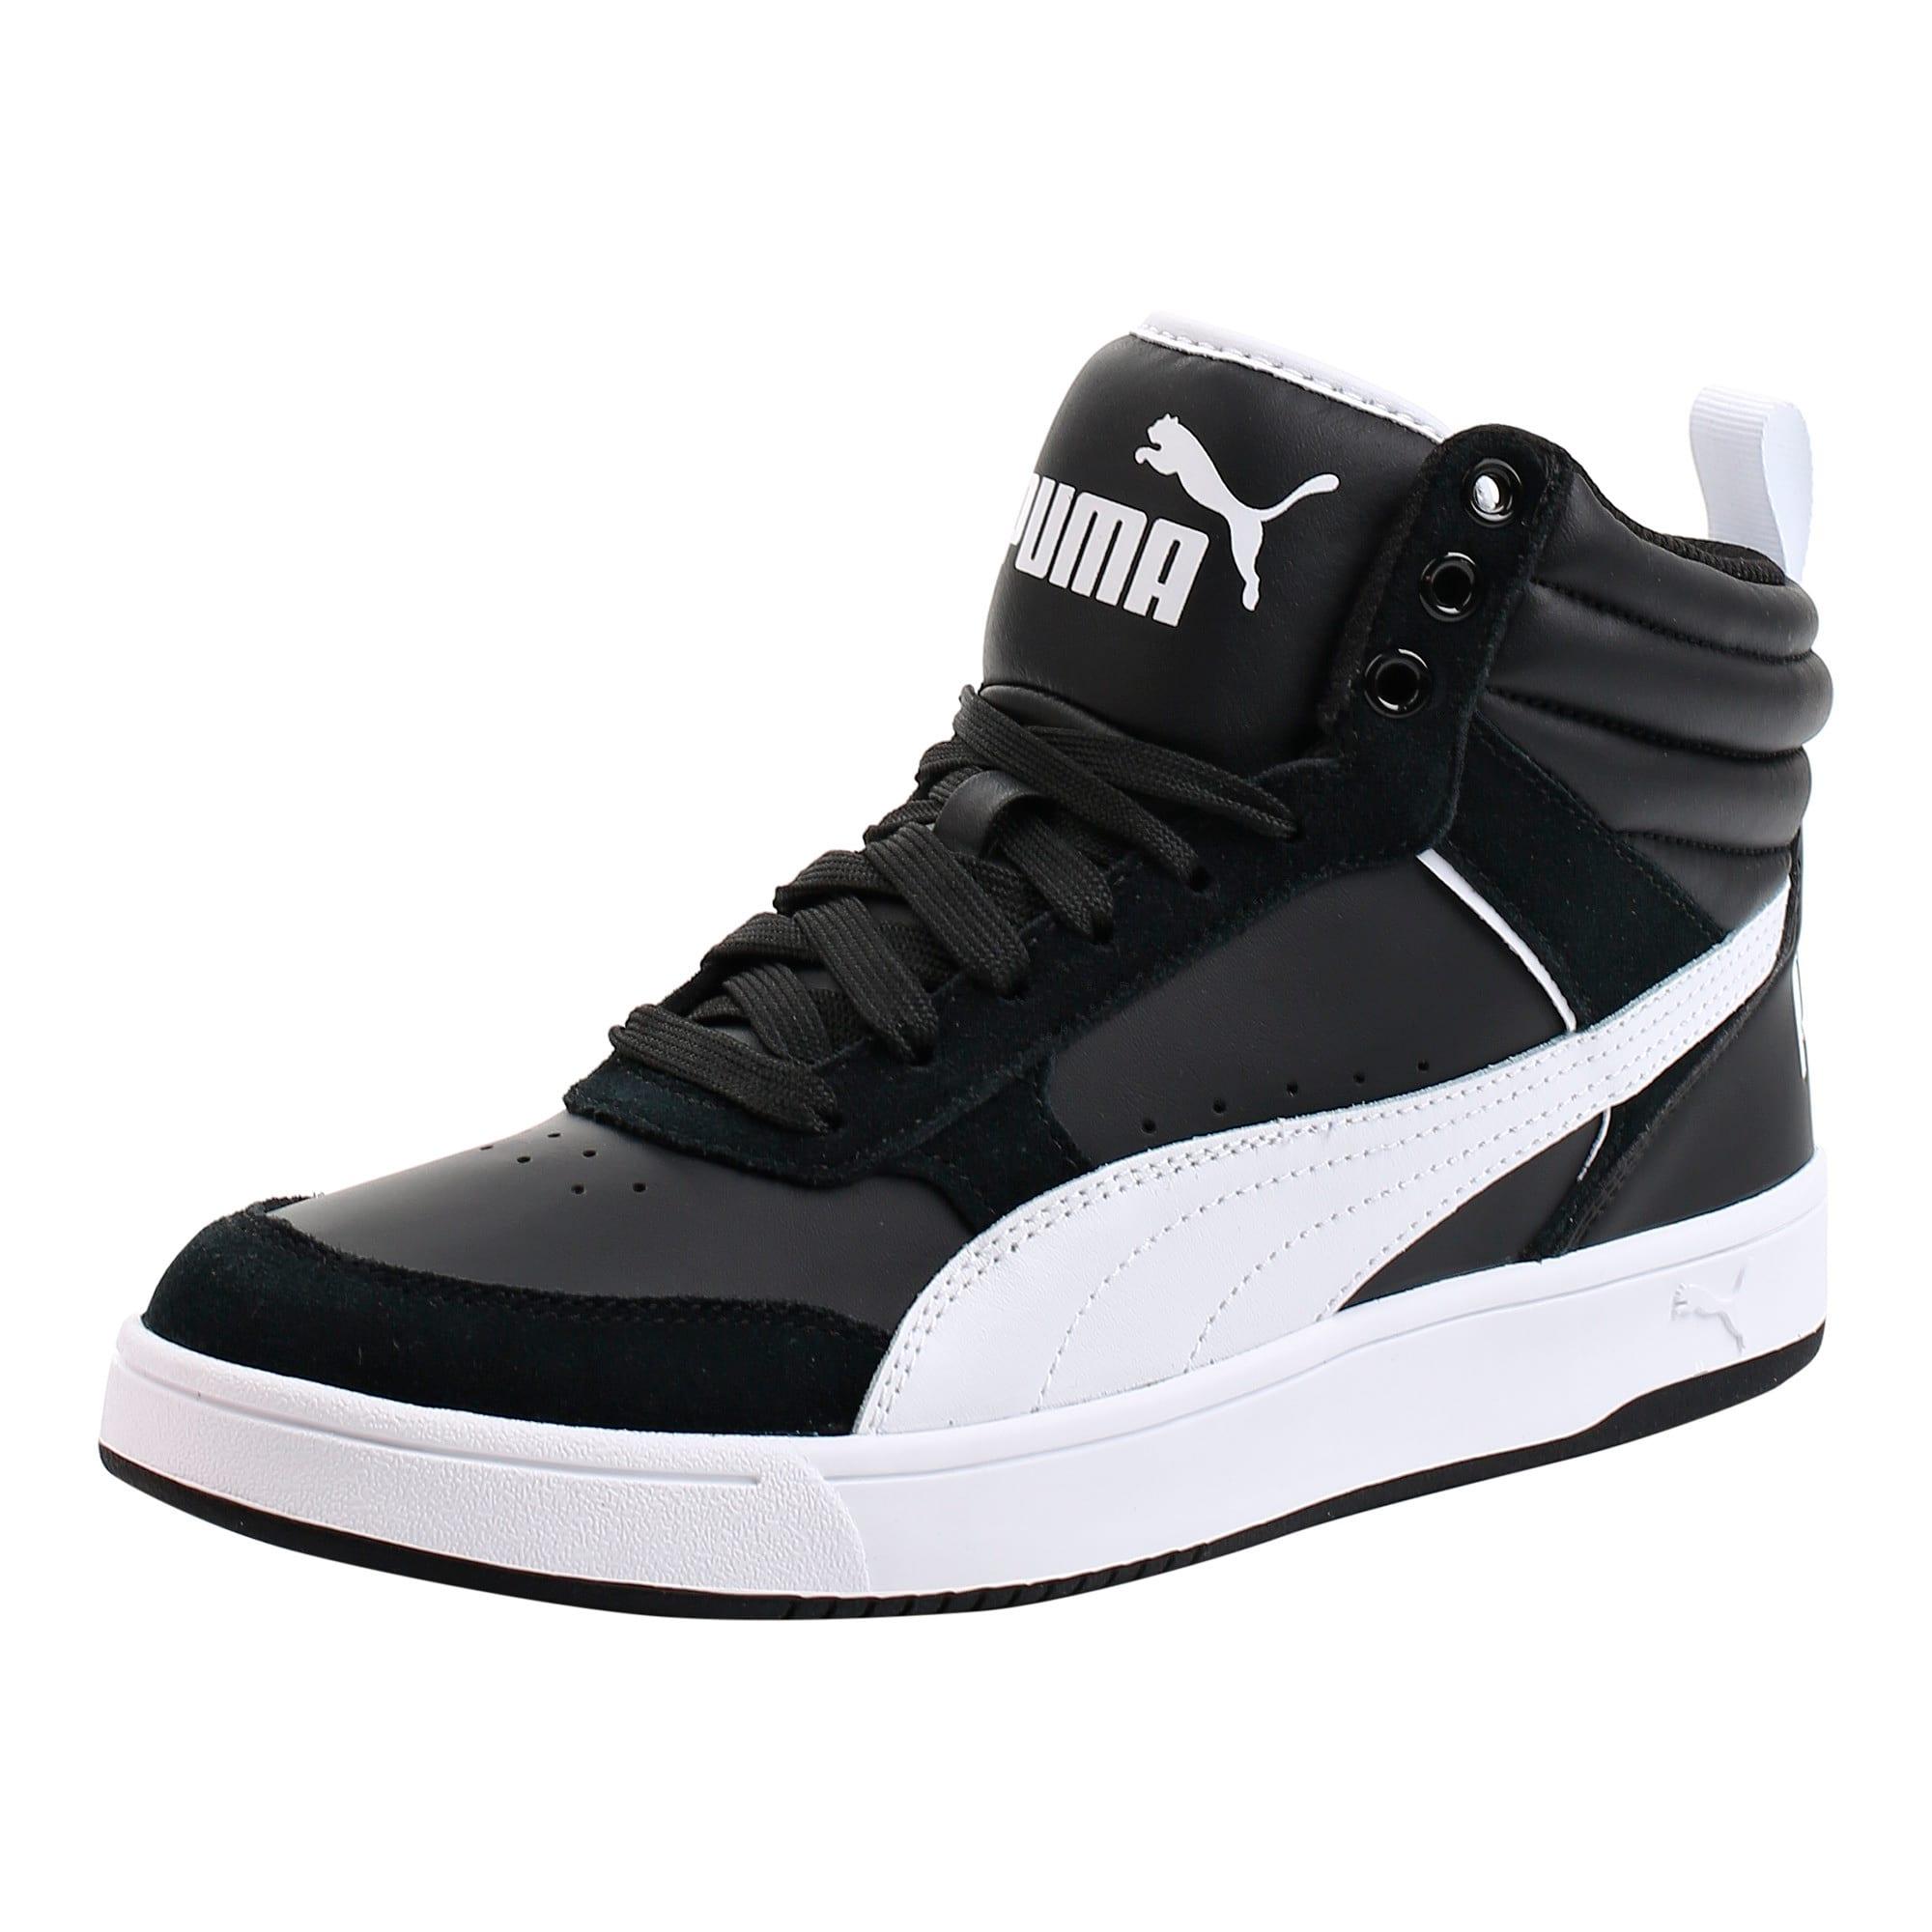 Thumbnail 1 of Puma Rebound Street v2 Sneakers, Puma Black-Puma White, medium